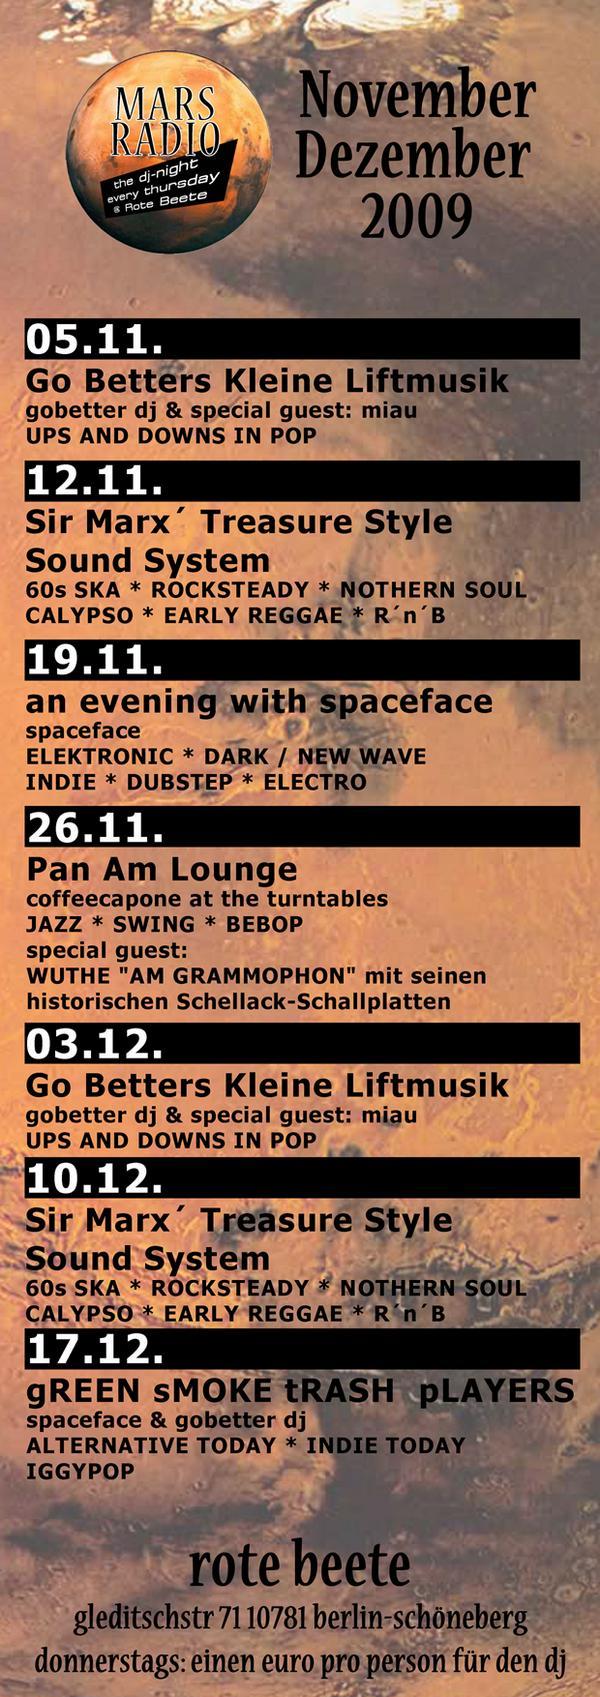 Mars Radio Monatsübersicht 11./12.2009 designed by Designjockey